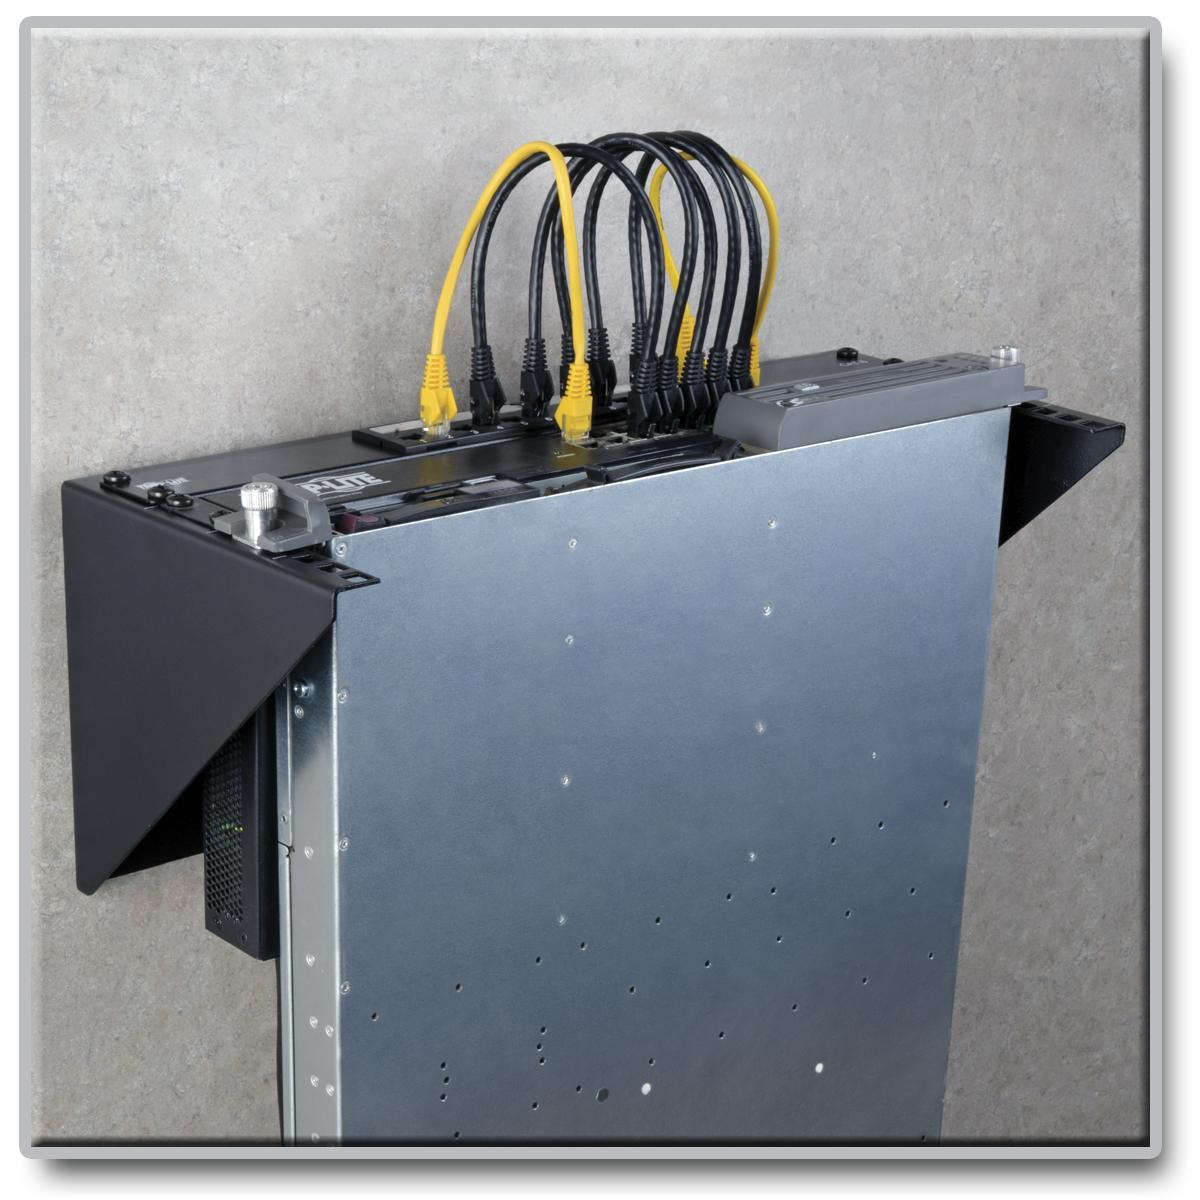 Amazon Com Plantronics Tripp Lite Wallmount Rack 4u